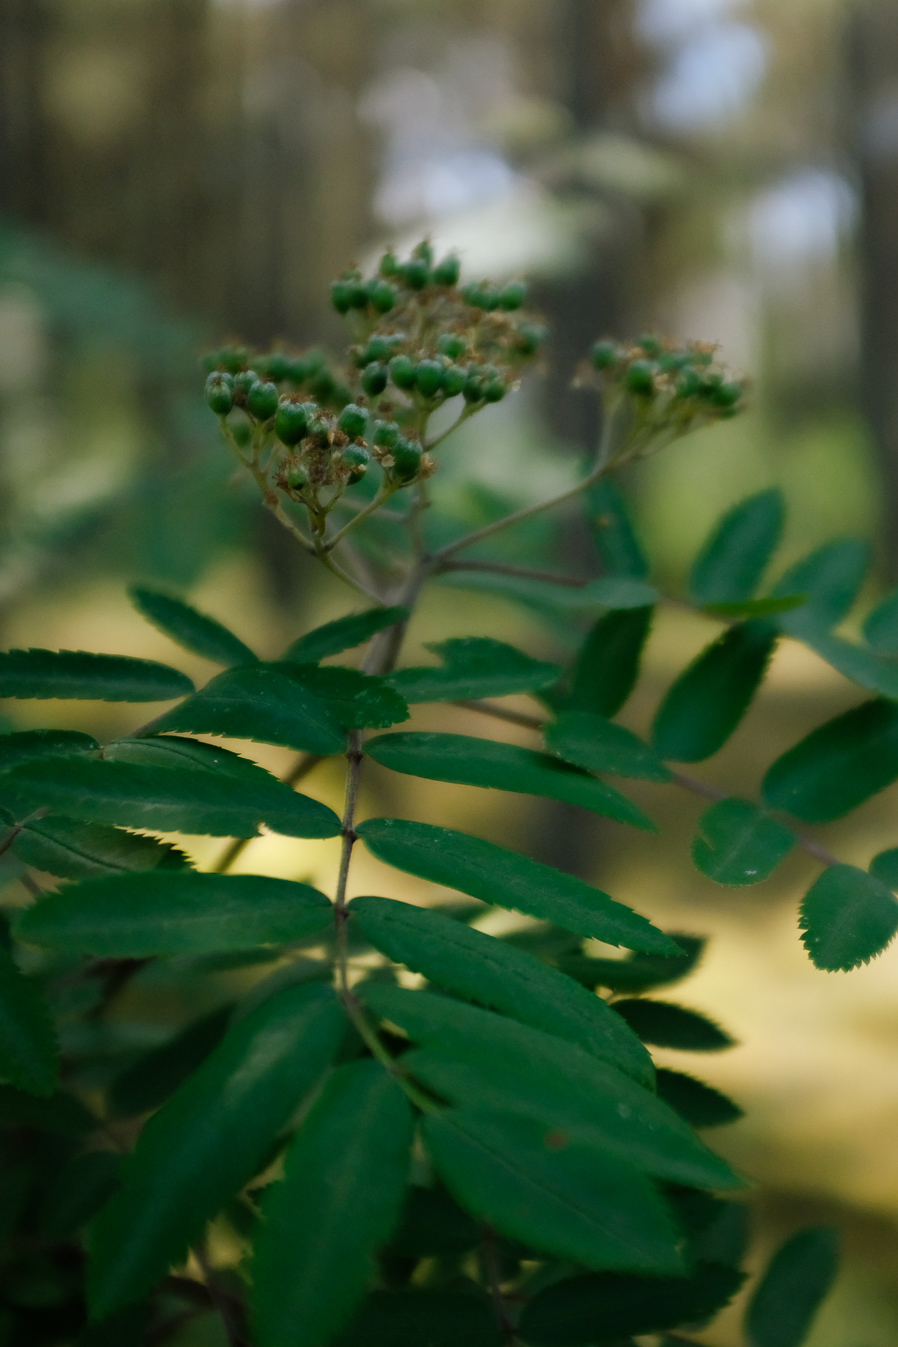 Young rowan plant